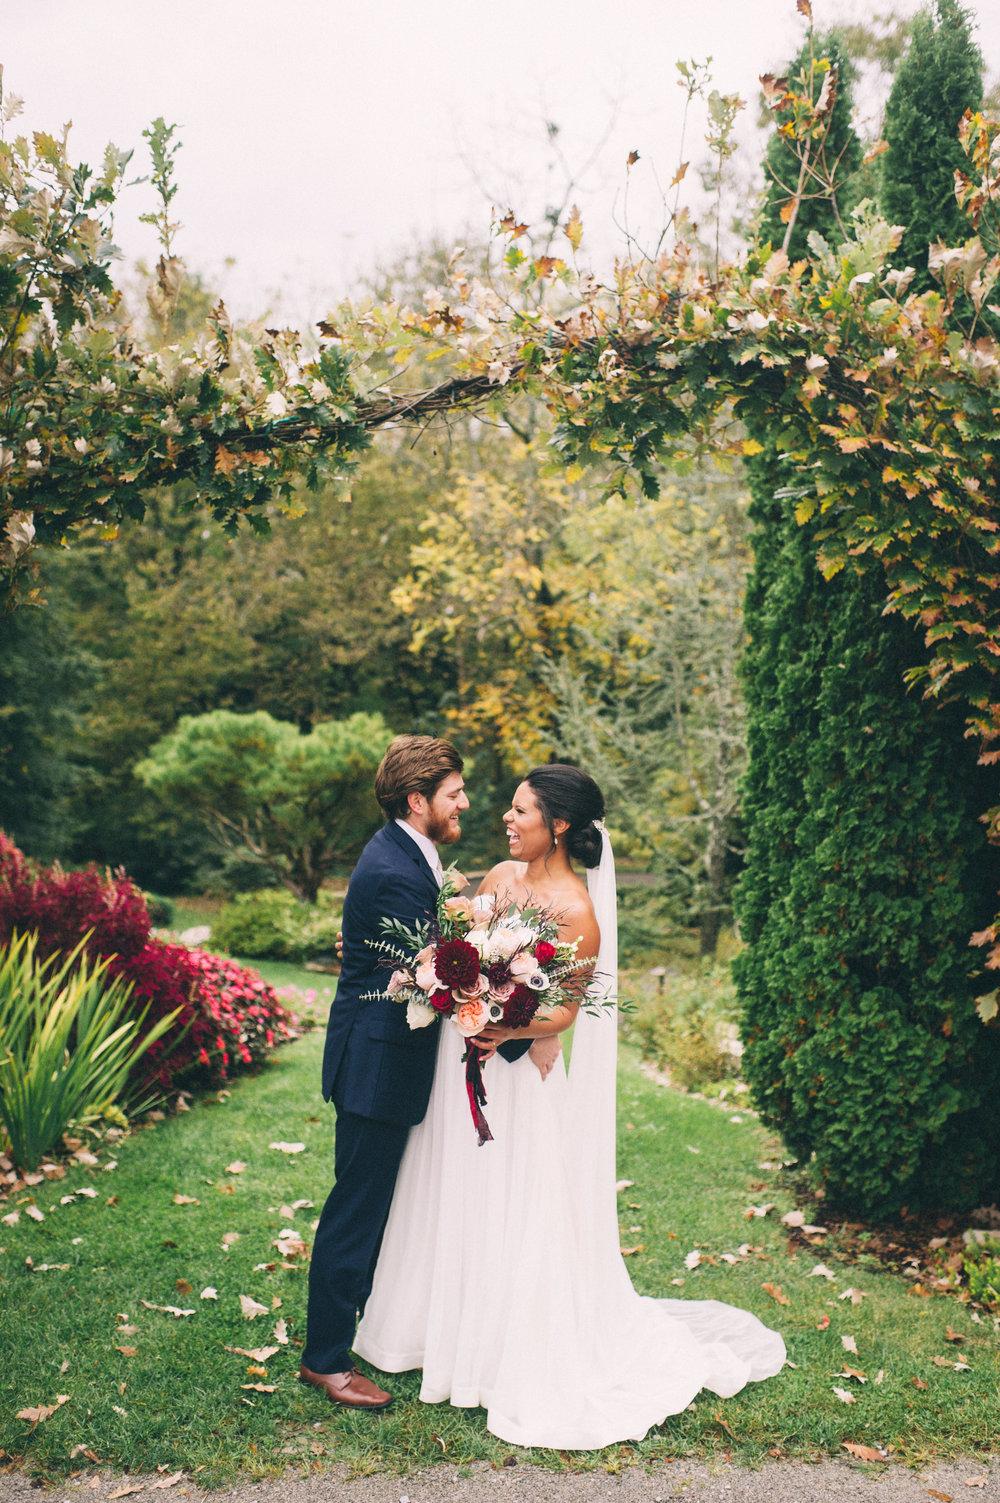 Micaha & Austin // Cozy Autumn Wedding at Springhouse Gardens // Lexington, Kentucky // Wedding Photography // Couple's Portraits